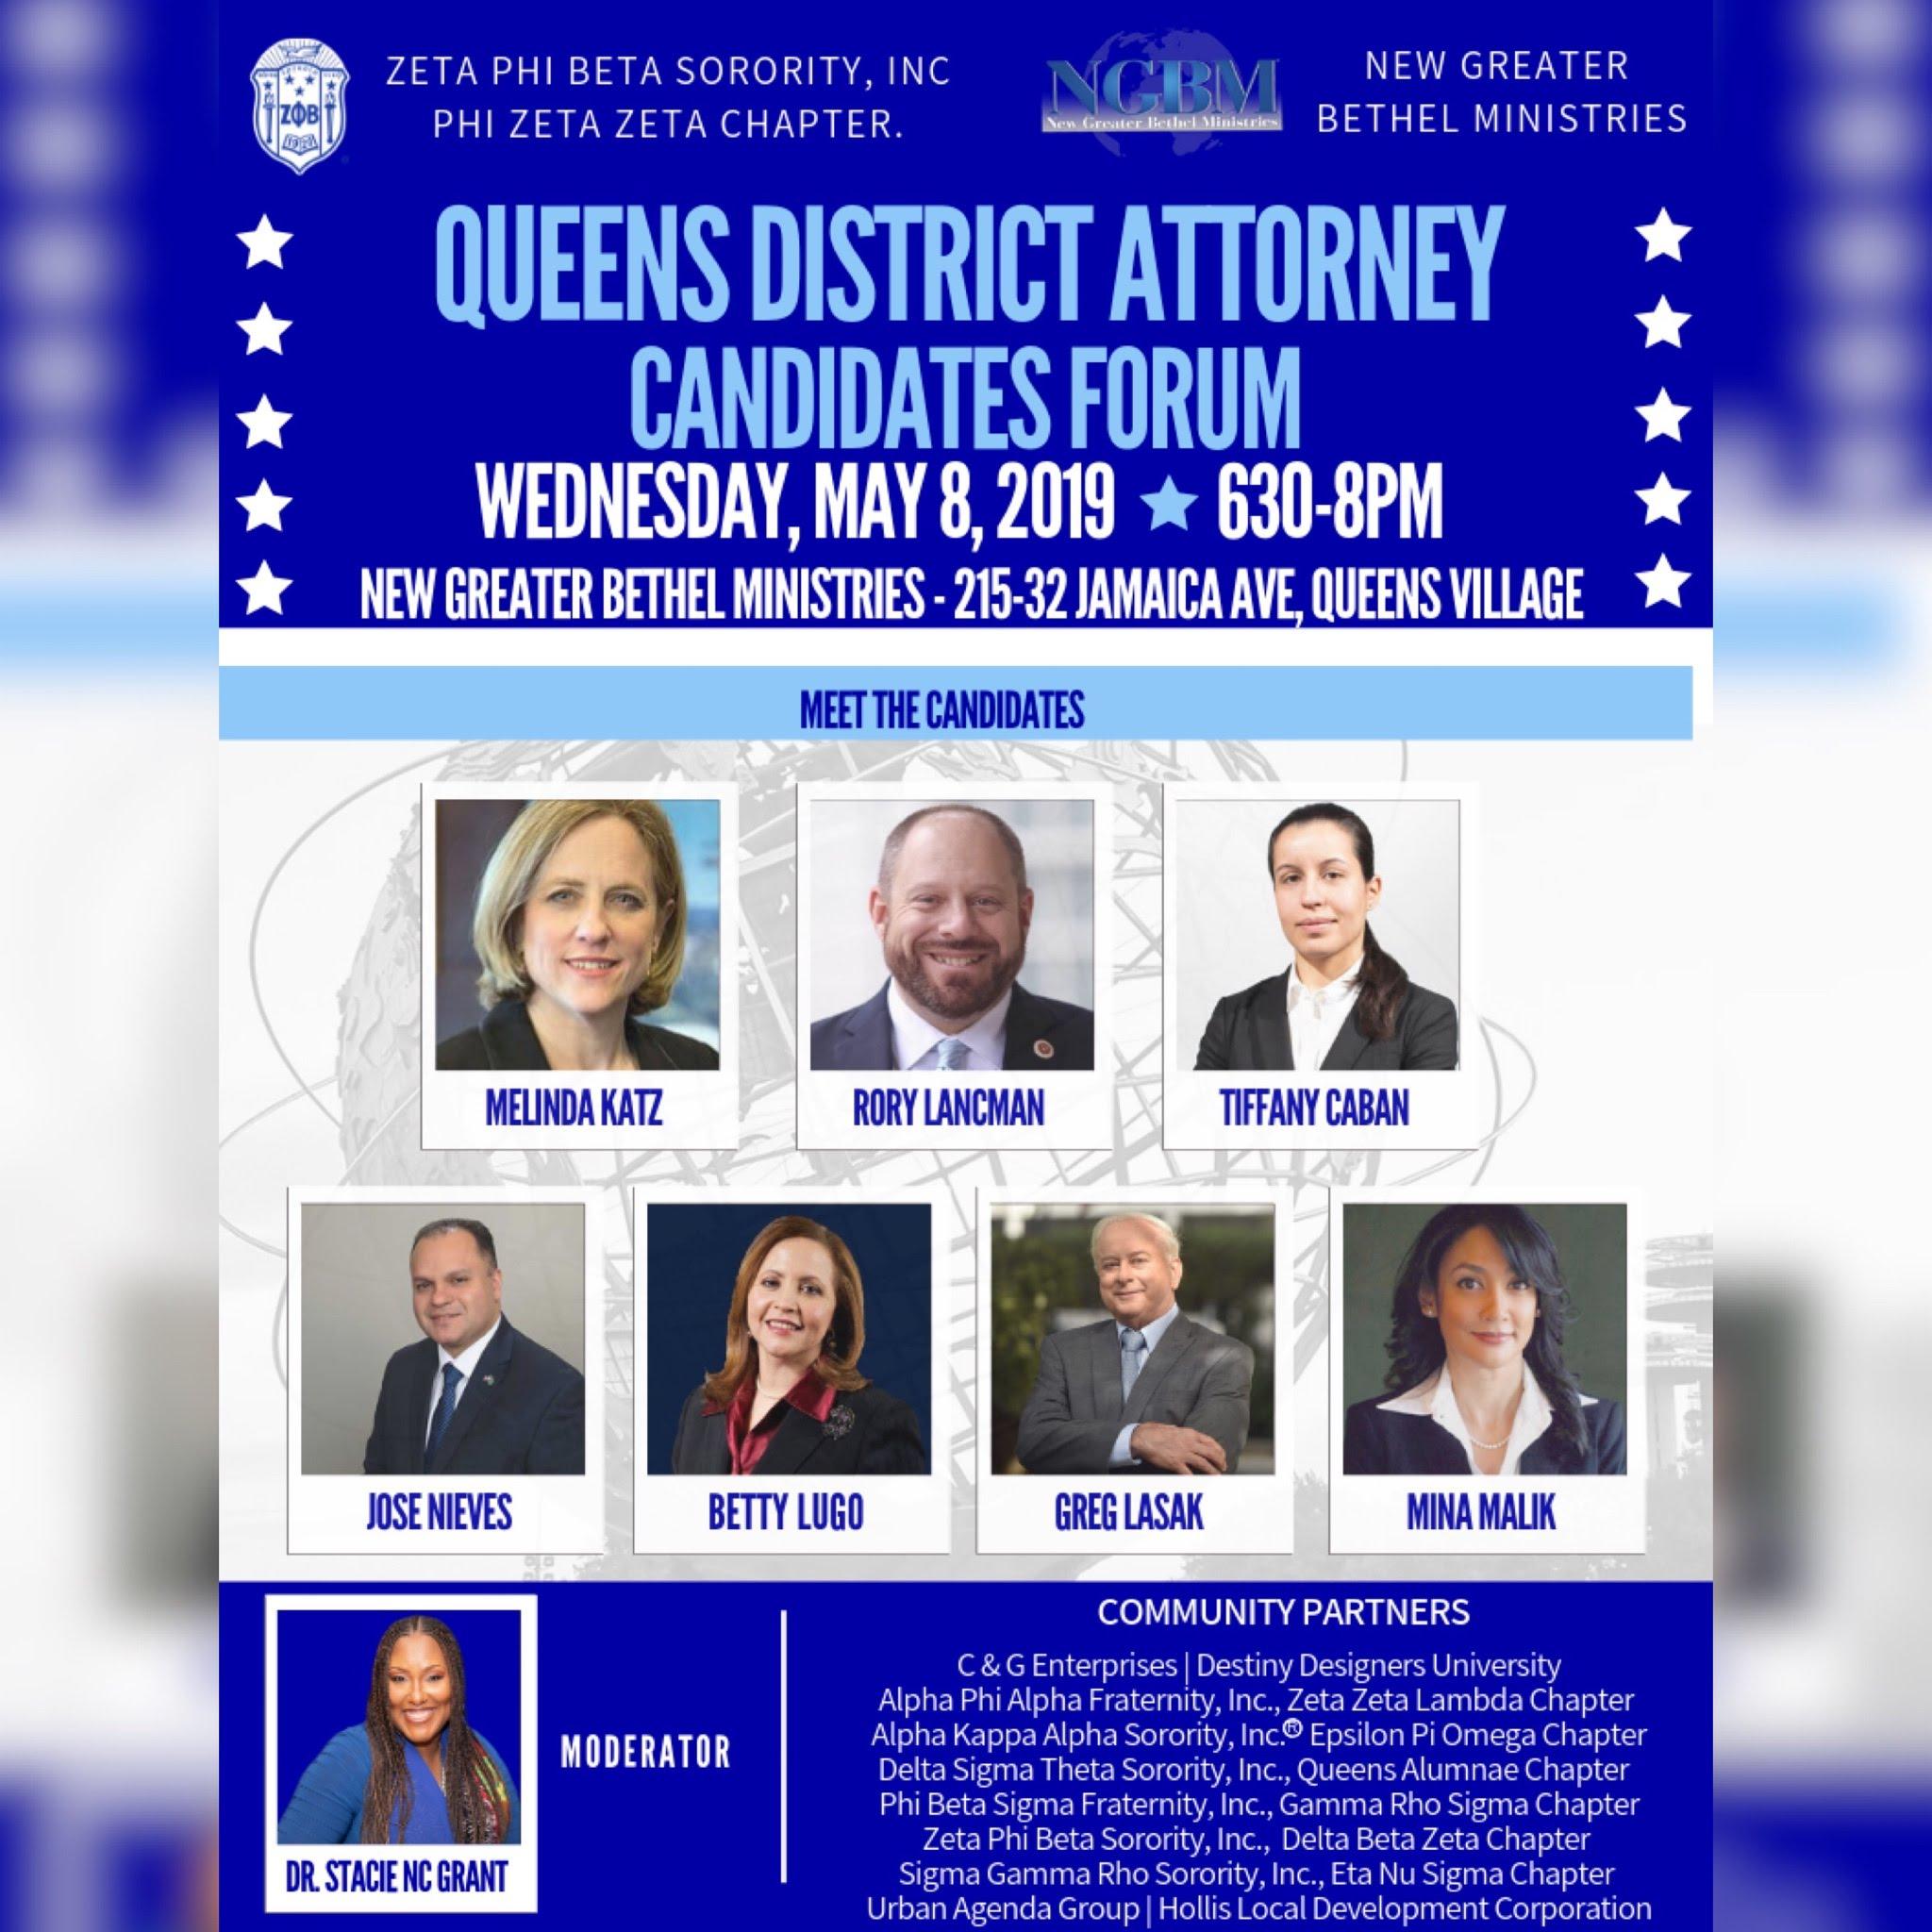 queens district attorney candidates